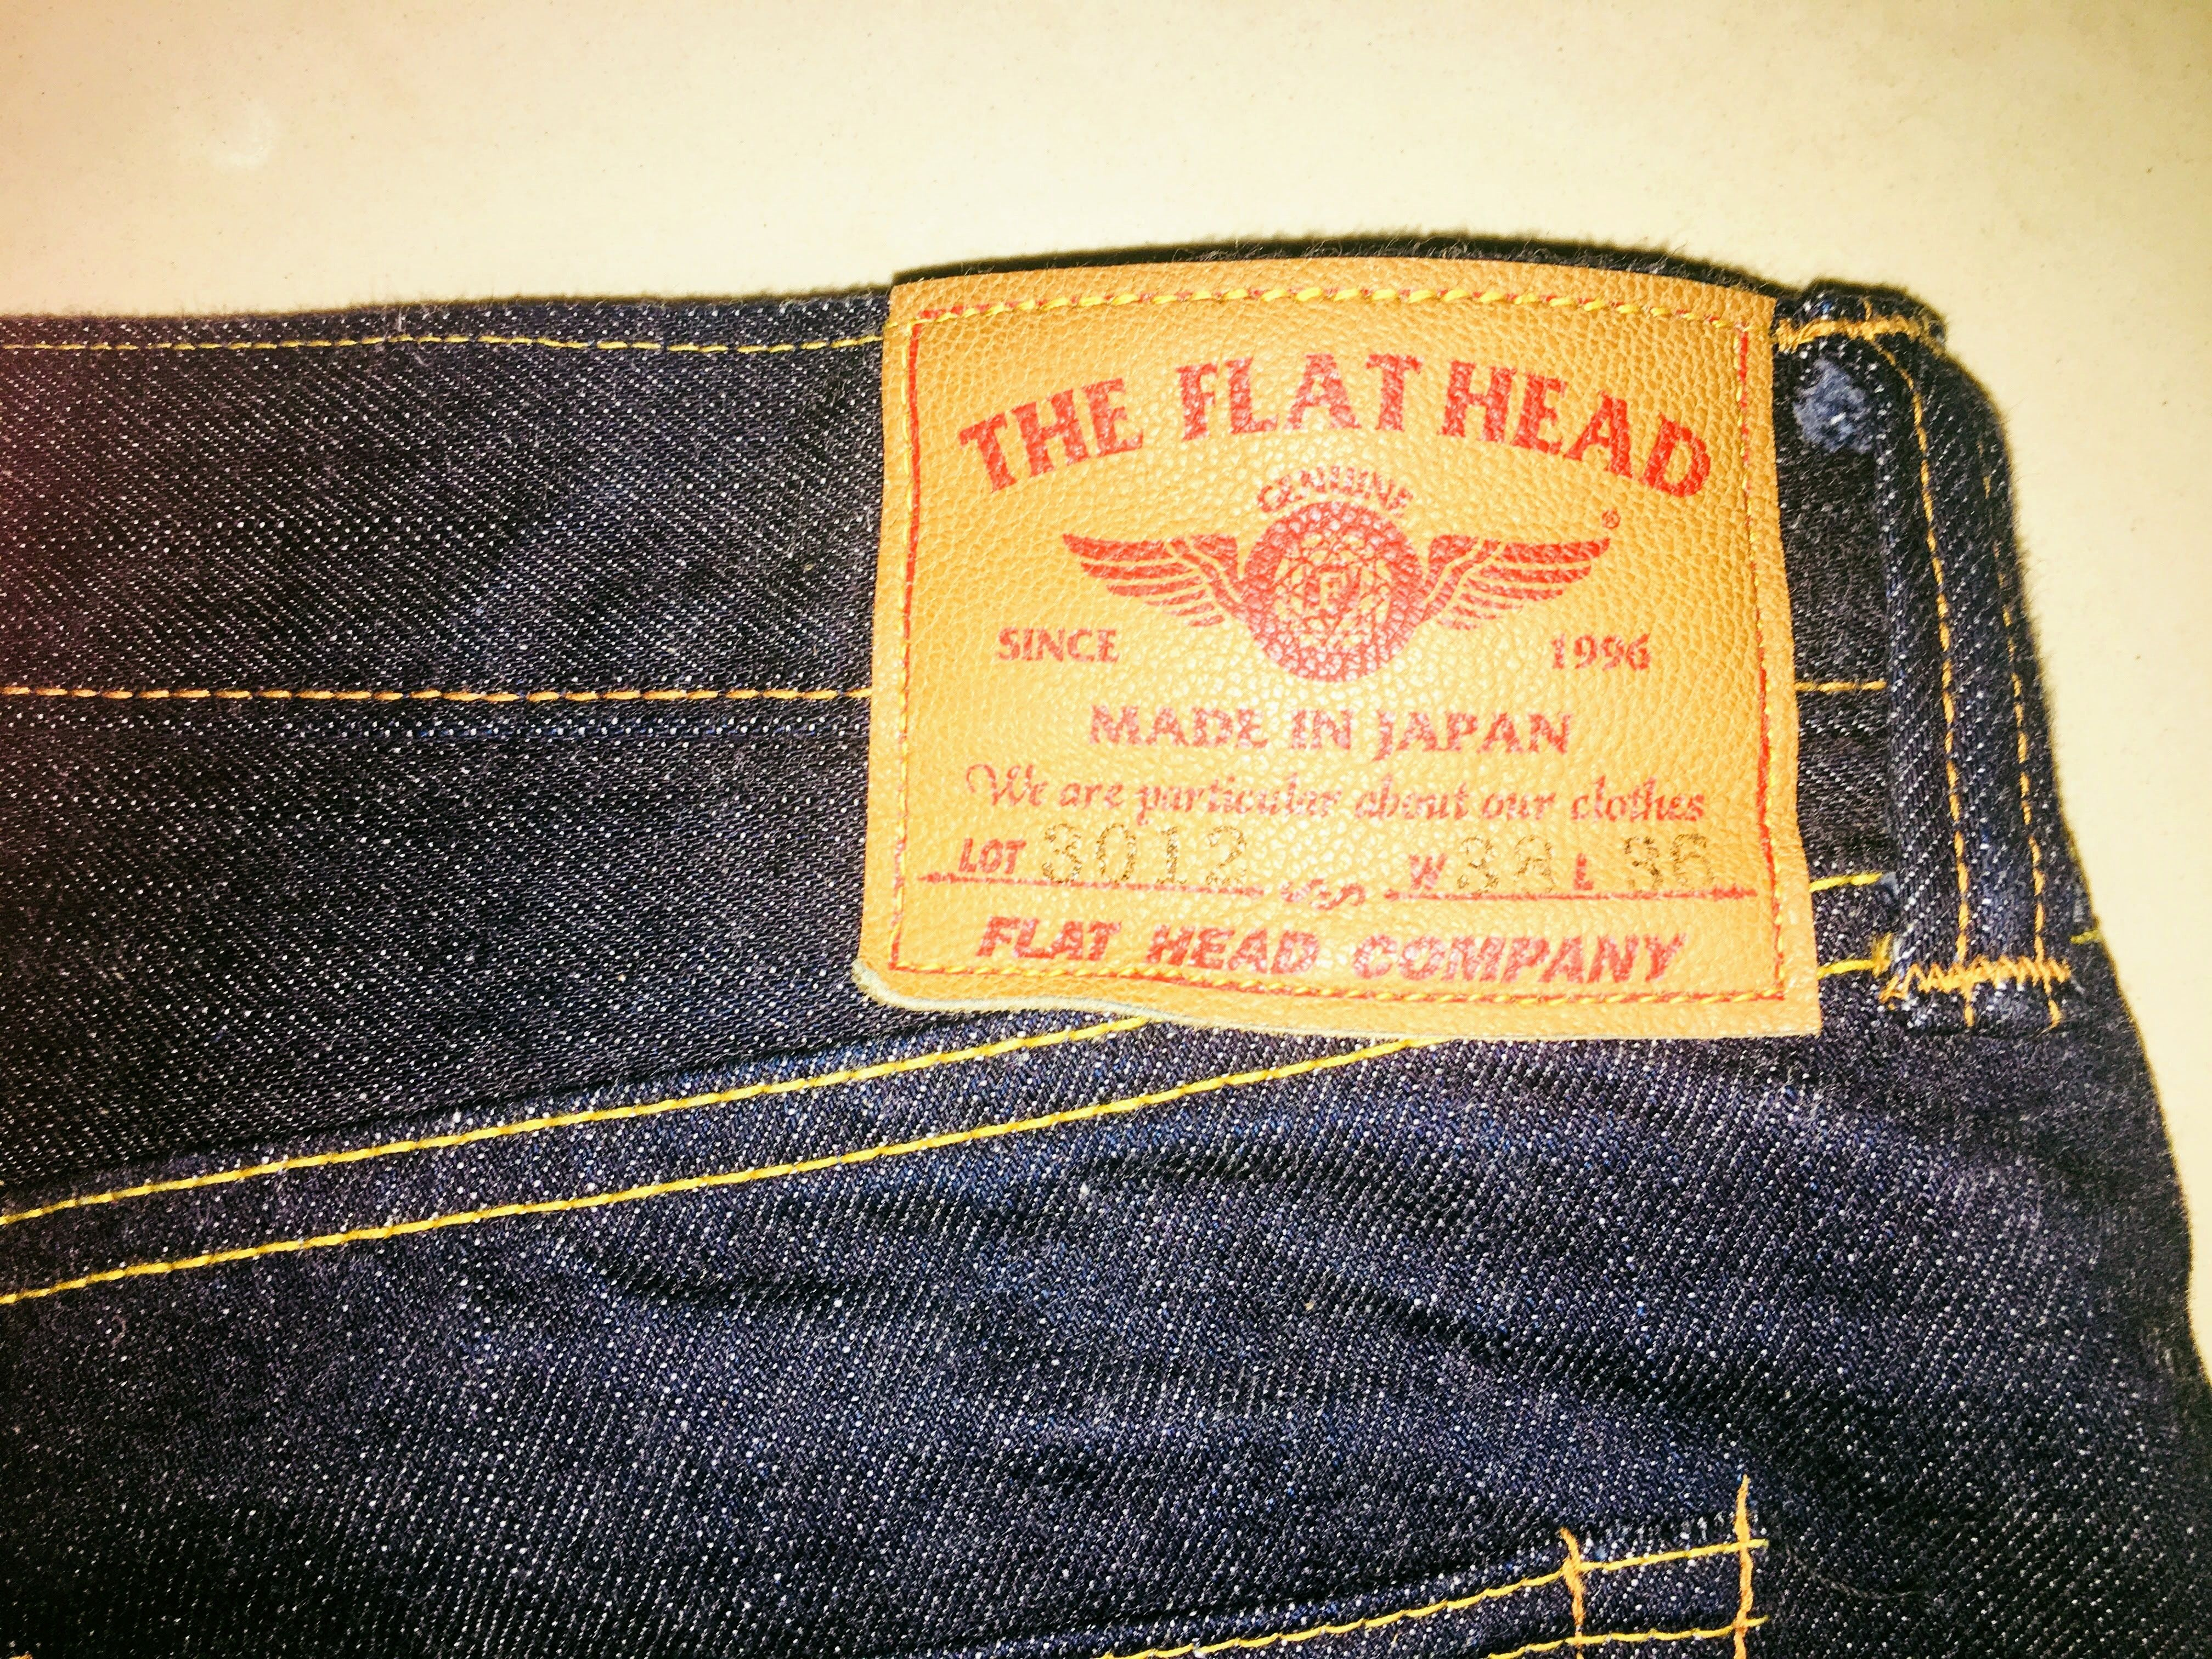 THE FLAT HEAD  3012